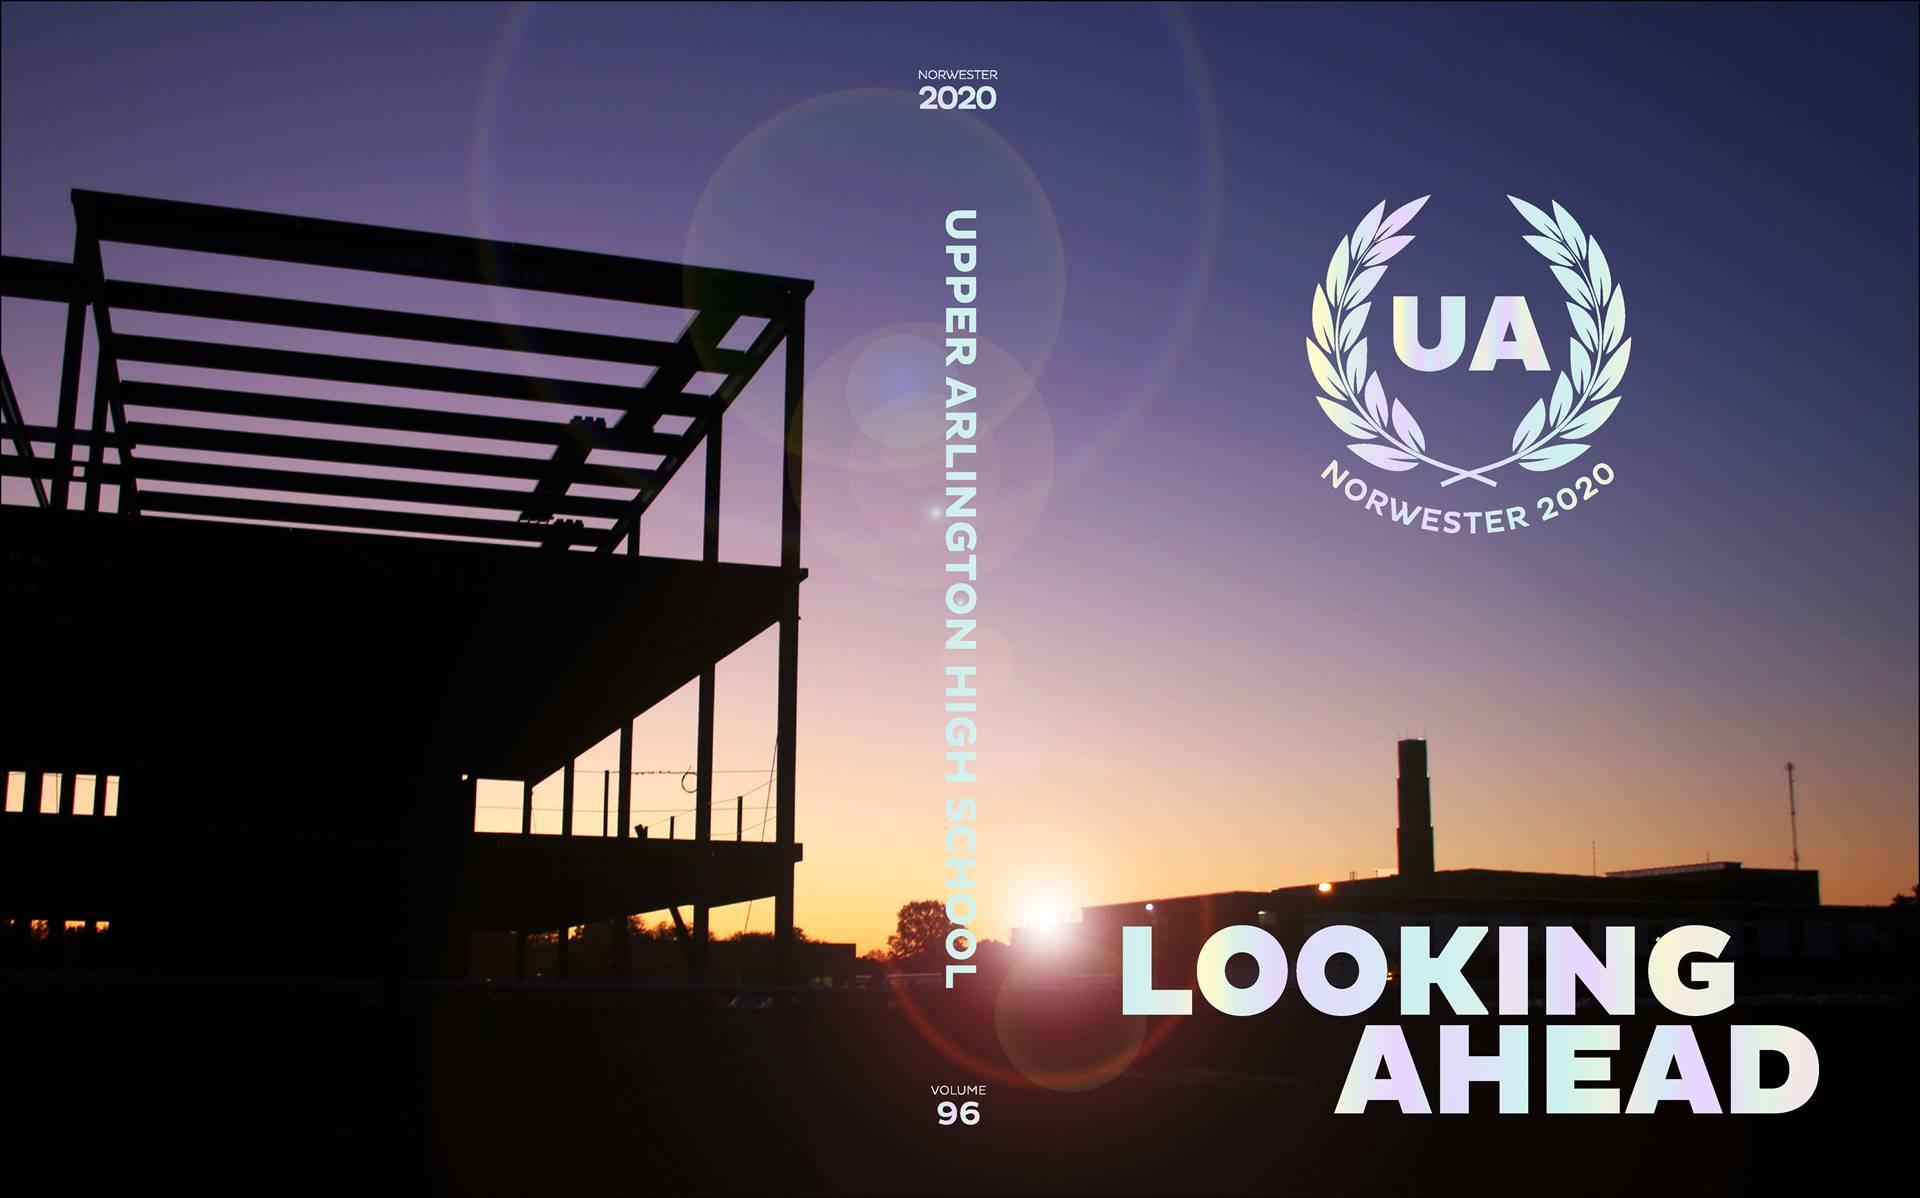 V Norwester 2020 Cover